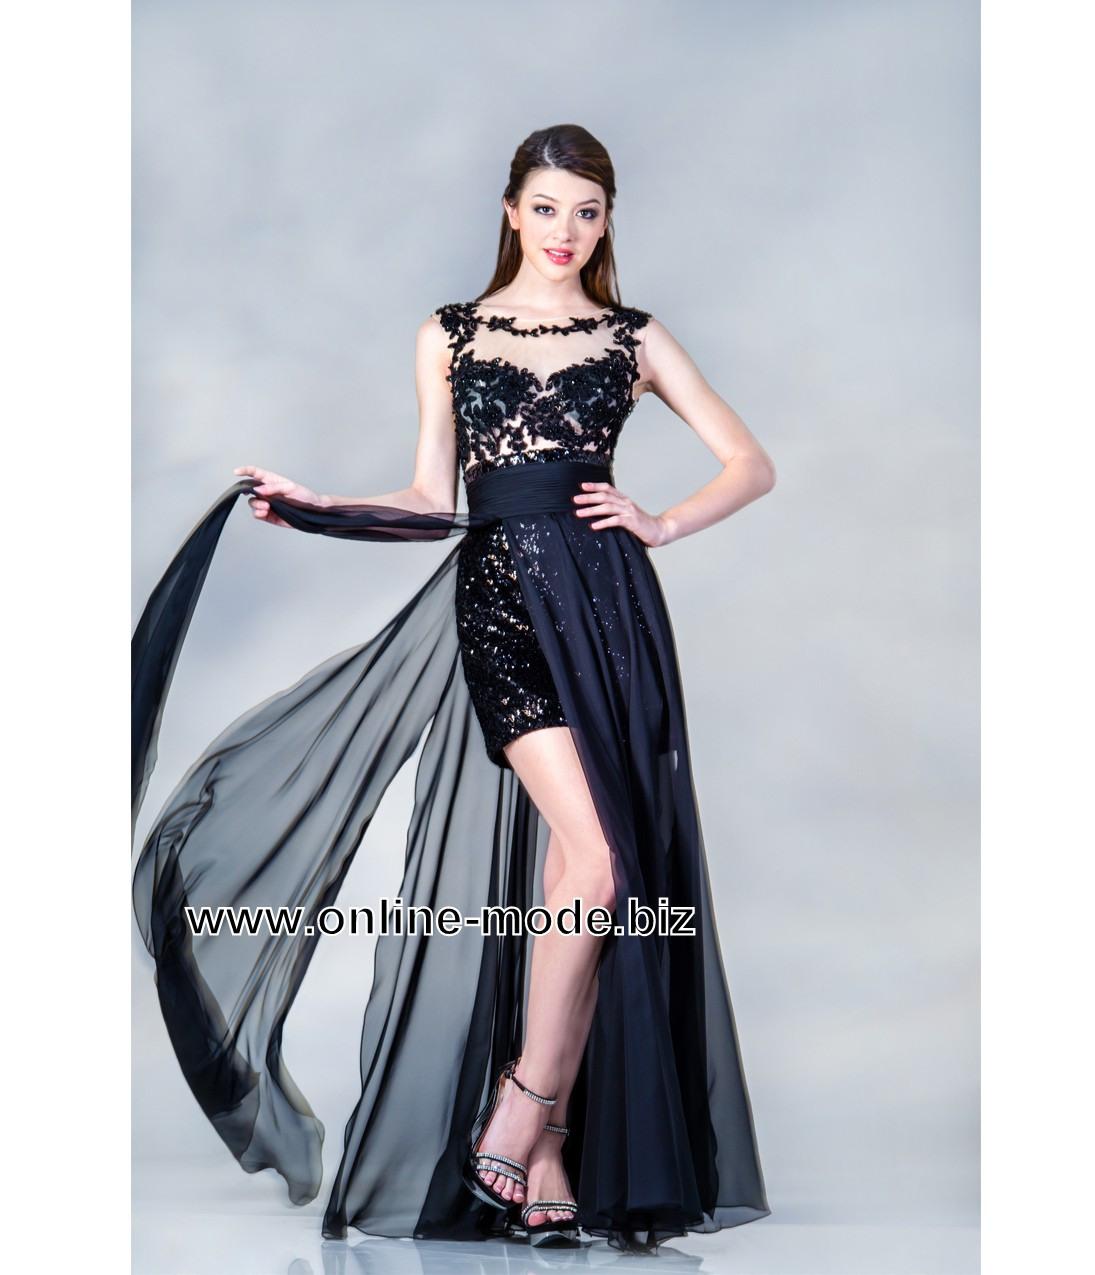 13 Großartig Abend-Vokuhila-Kleid BoutiqueFormal Schön Abend-Vokuhila-Kleid Design